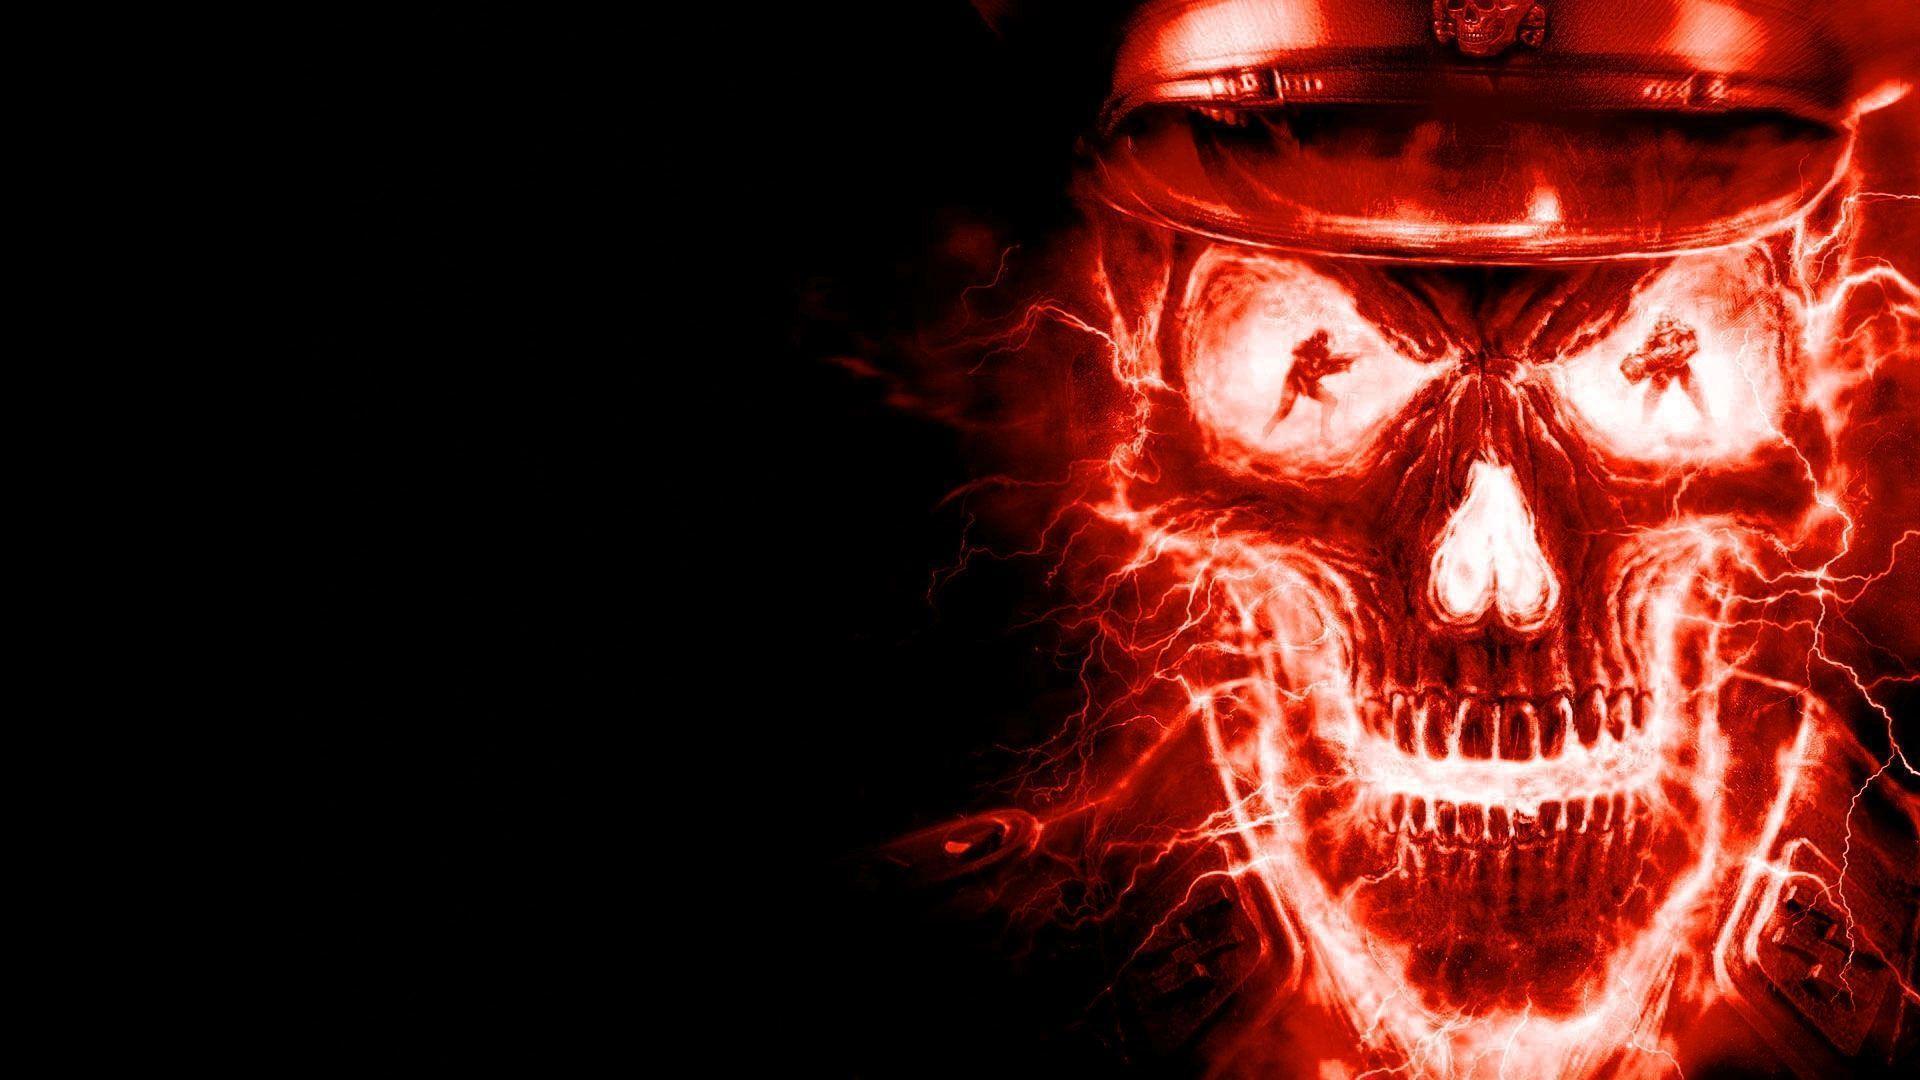 skulls on fire wallpapers